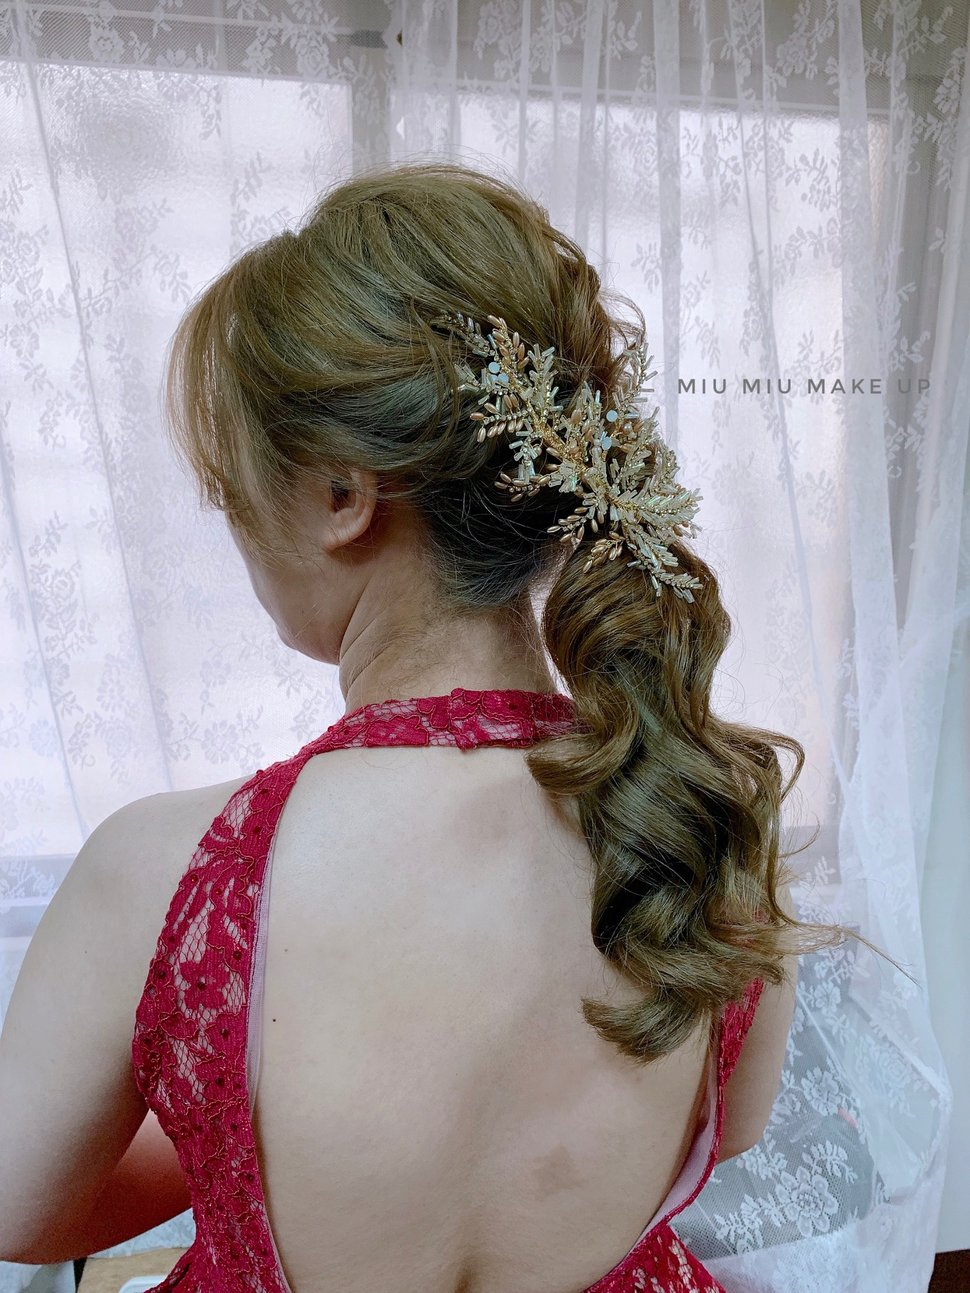 17E51337-276E-4D8E-B105-BBC799A9C2AF - Miu Miu Wang《結婚吧》